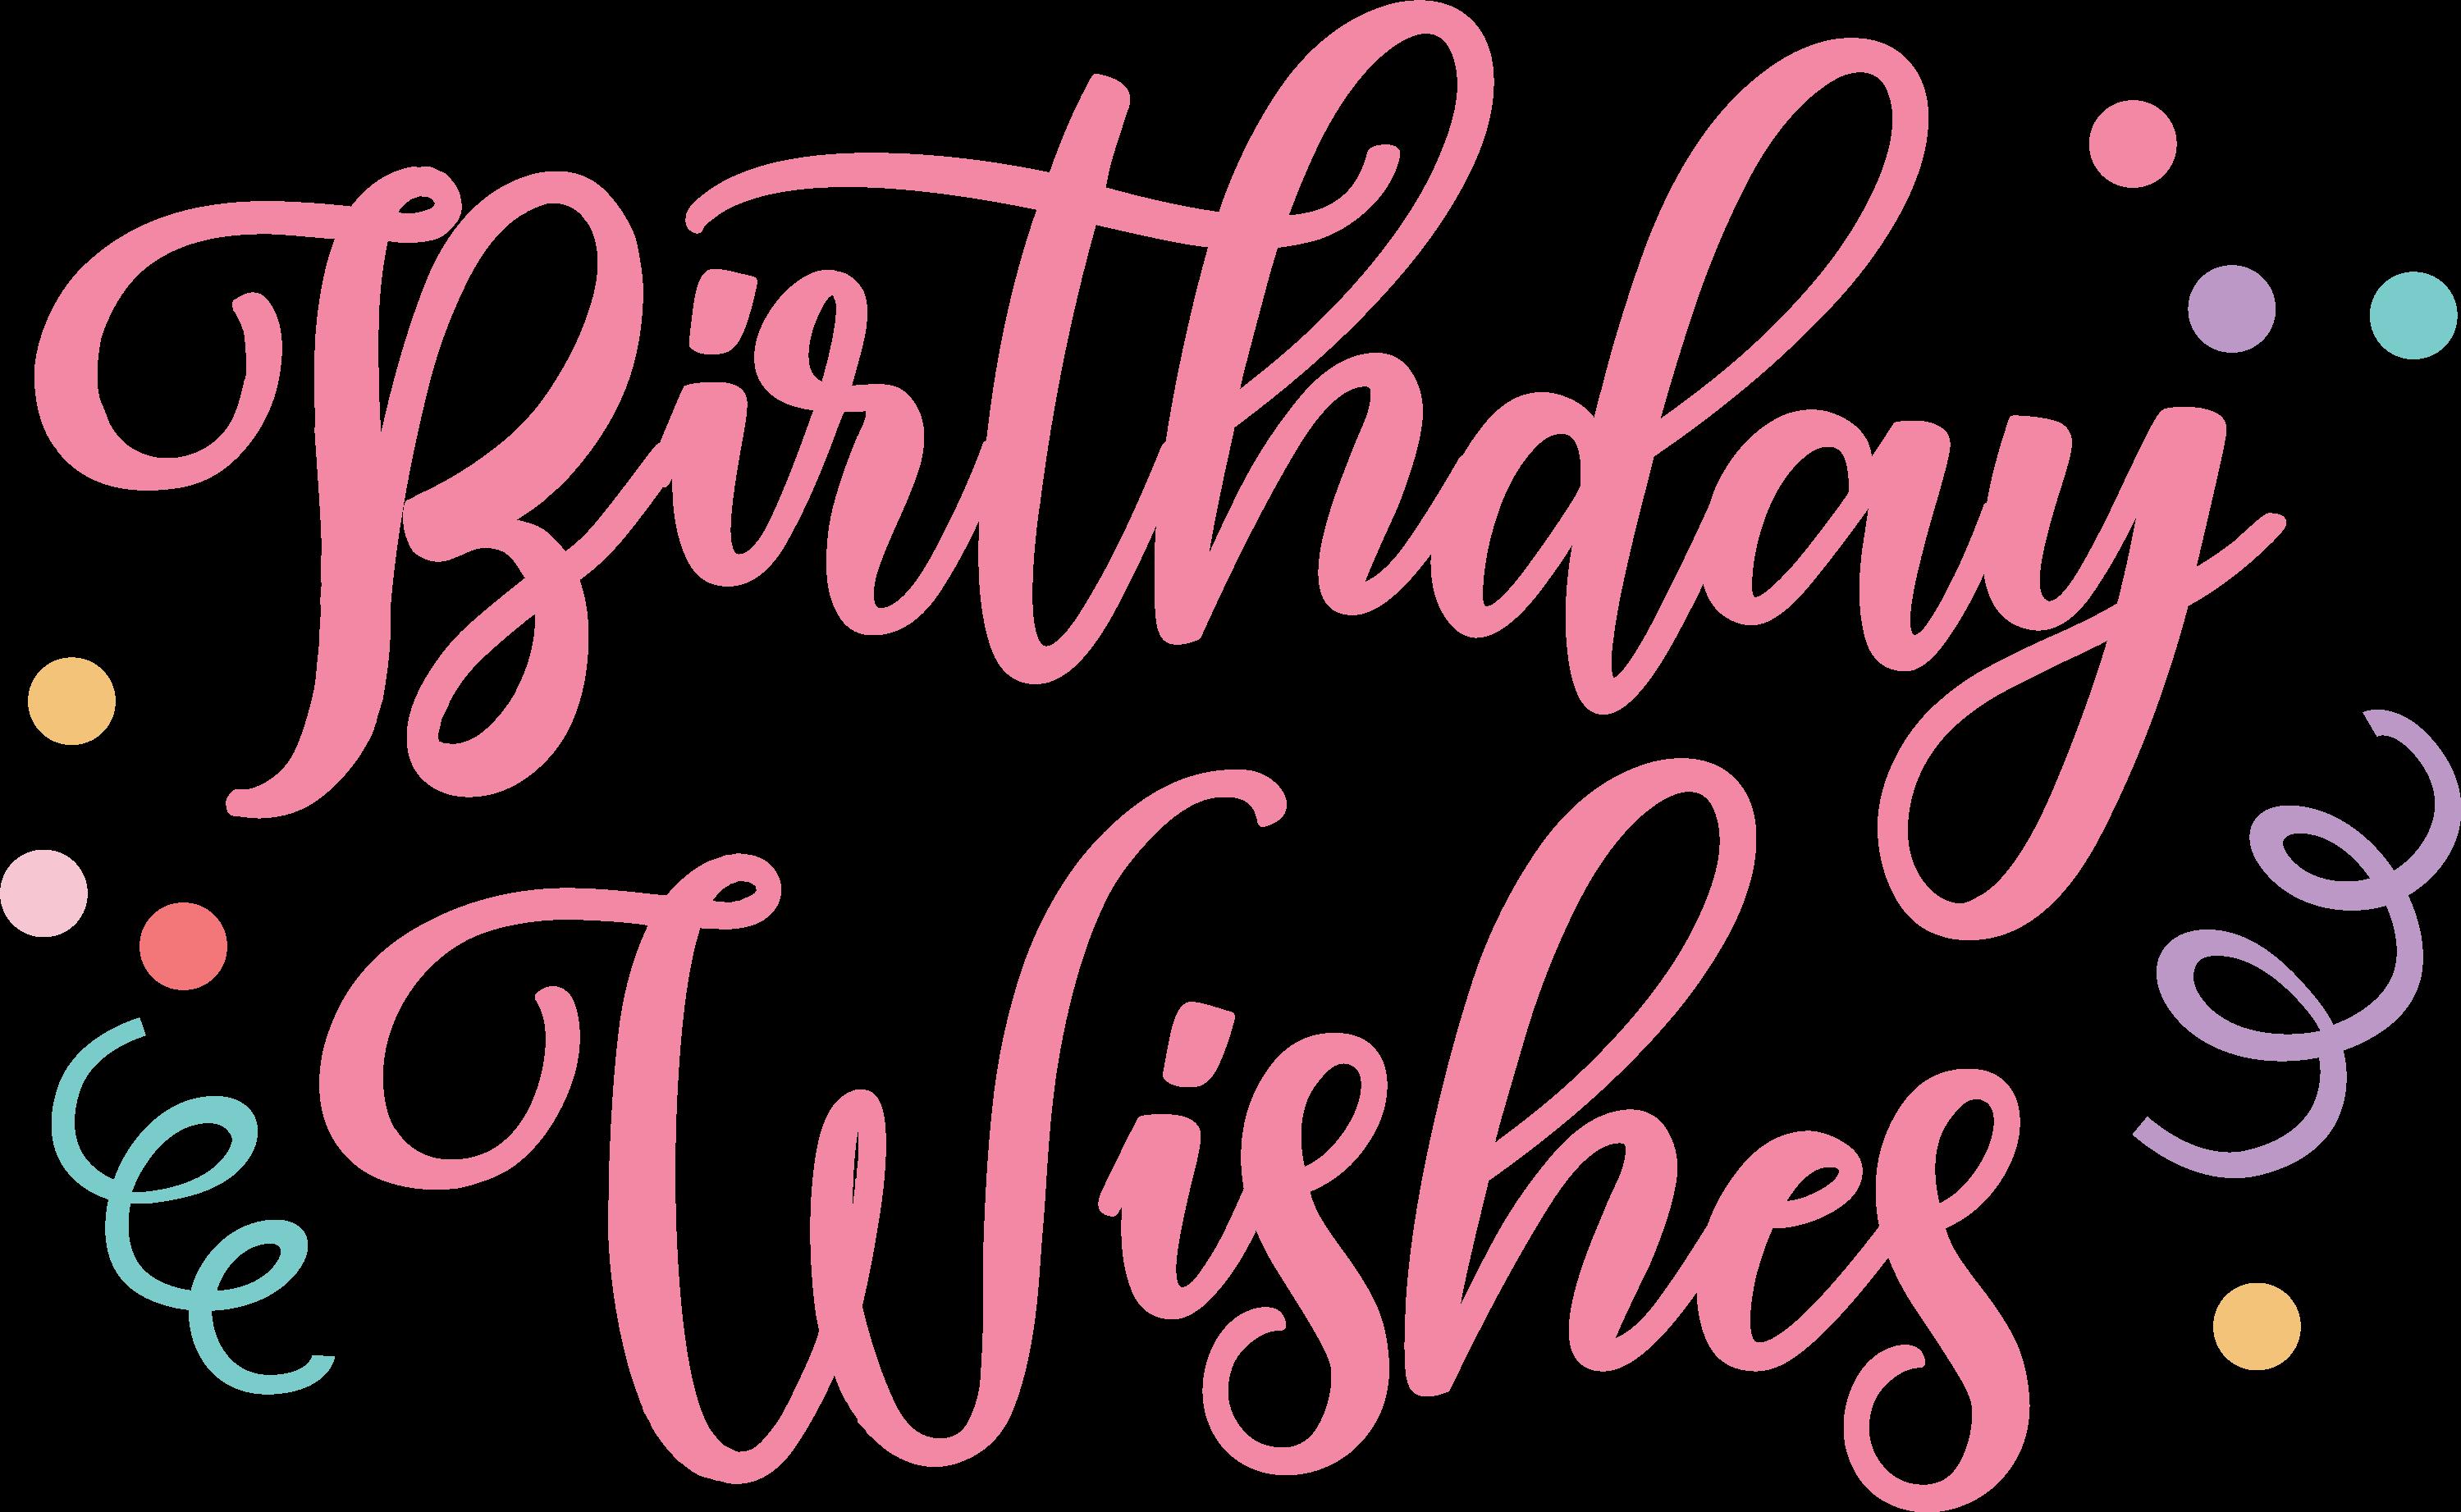 Birthday Wishes SVG Cut File